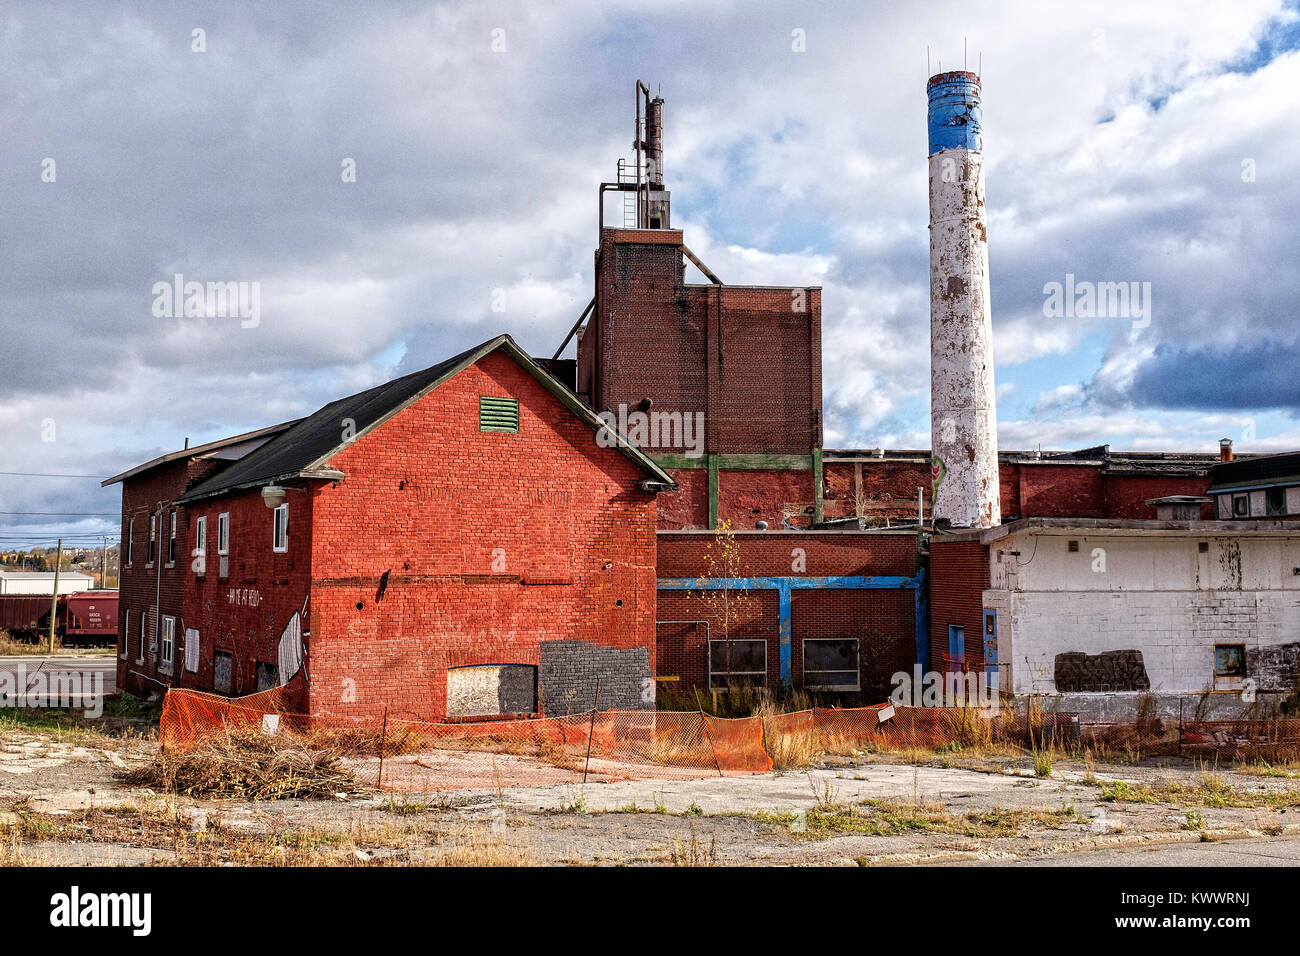 The old Doran's Brewery building, and old Sudbury landmark - Stock Image